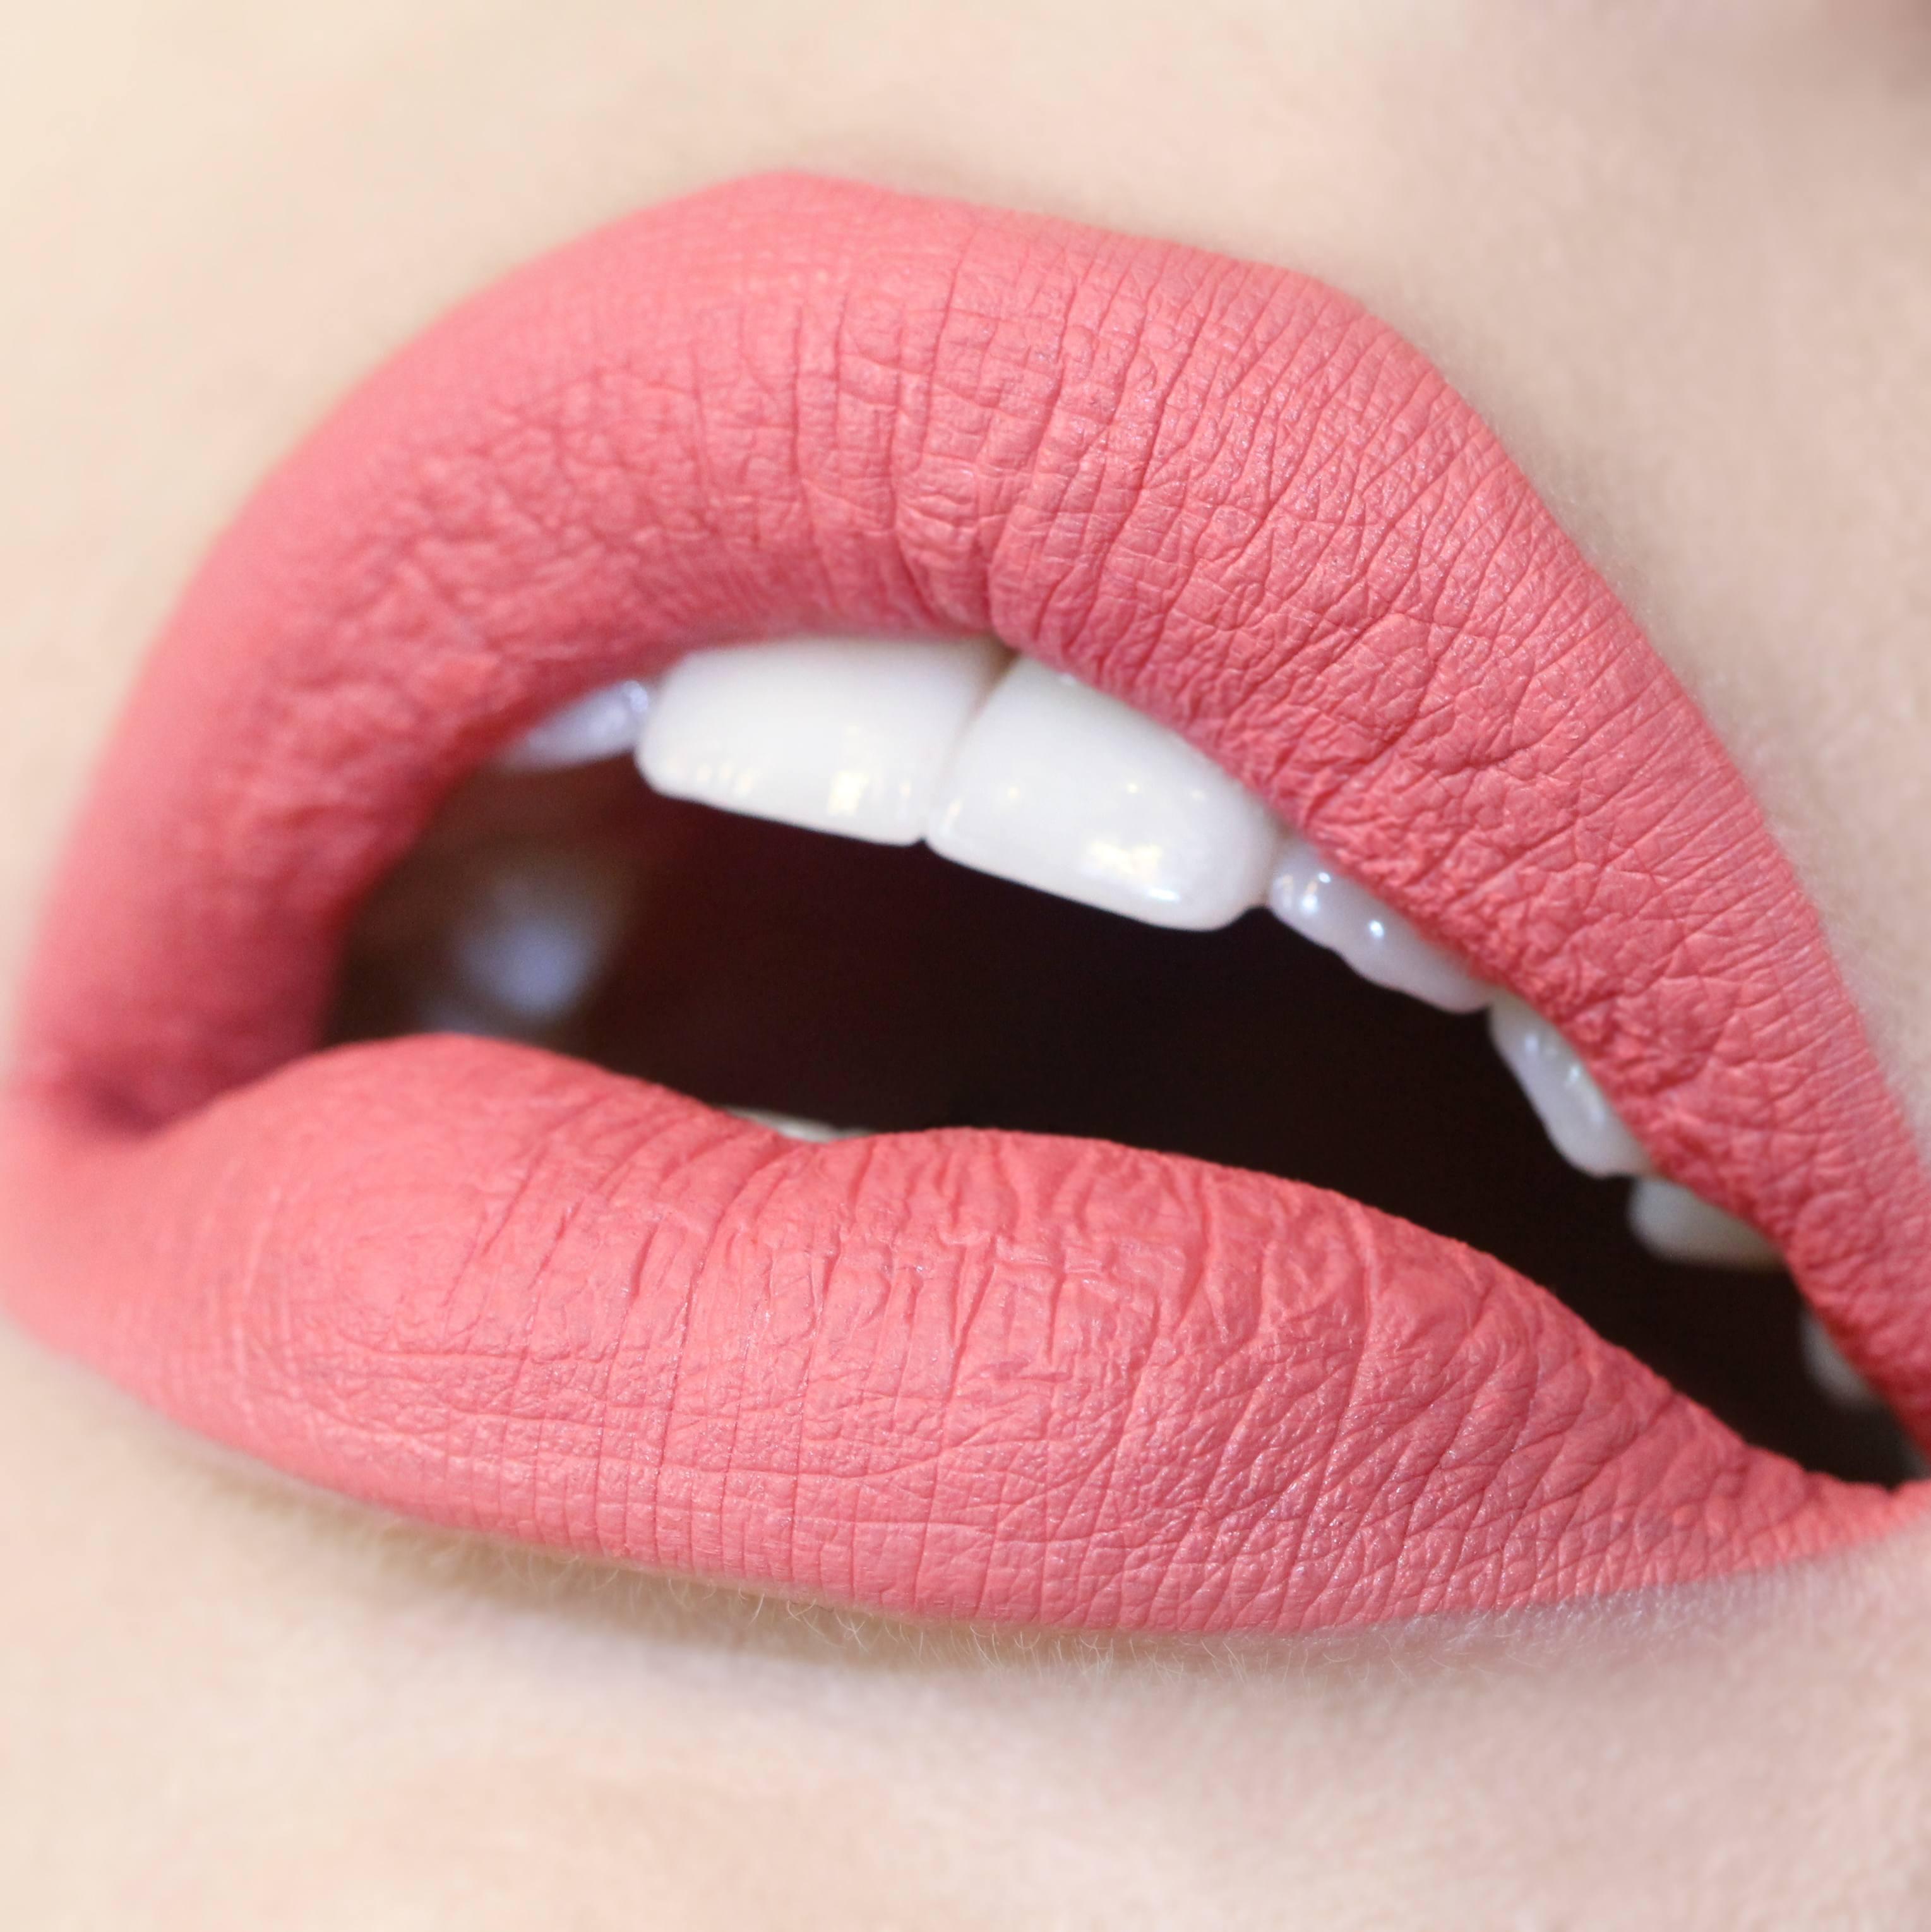 colourpop ultra matte lip สี donut